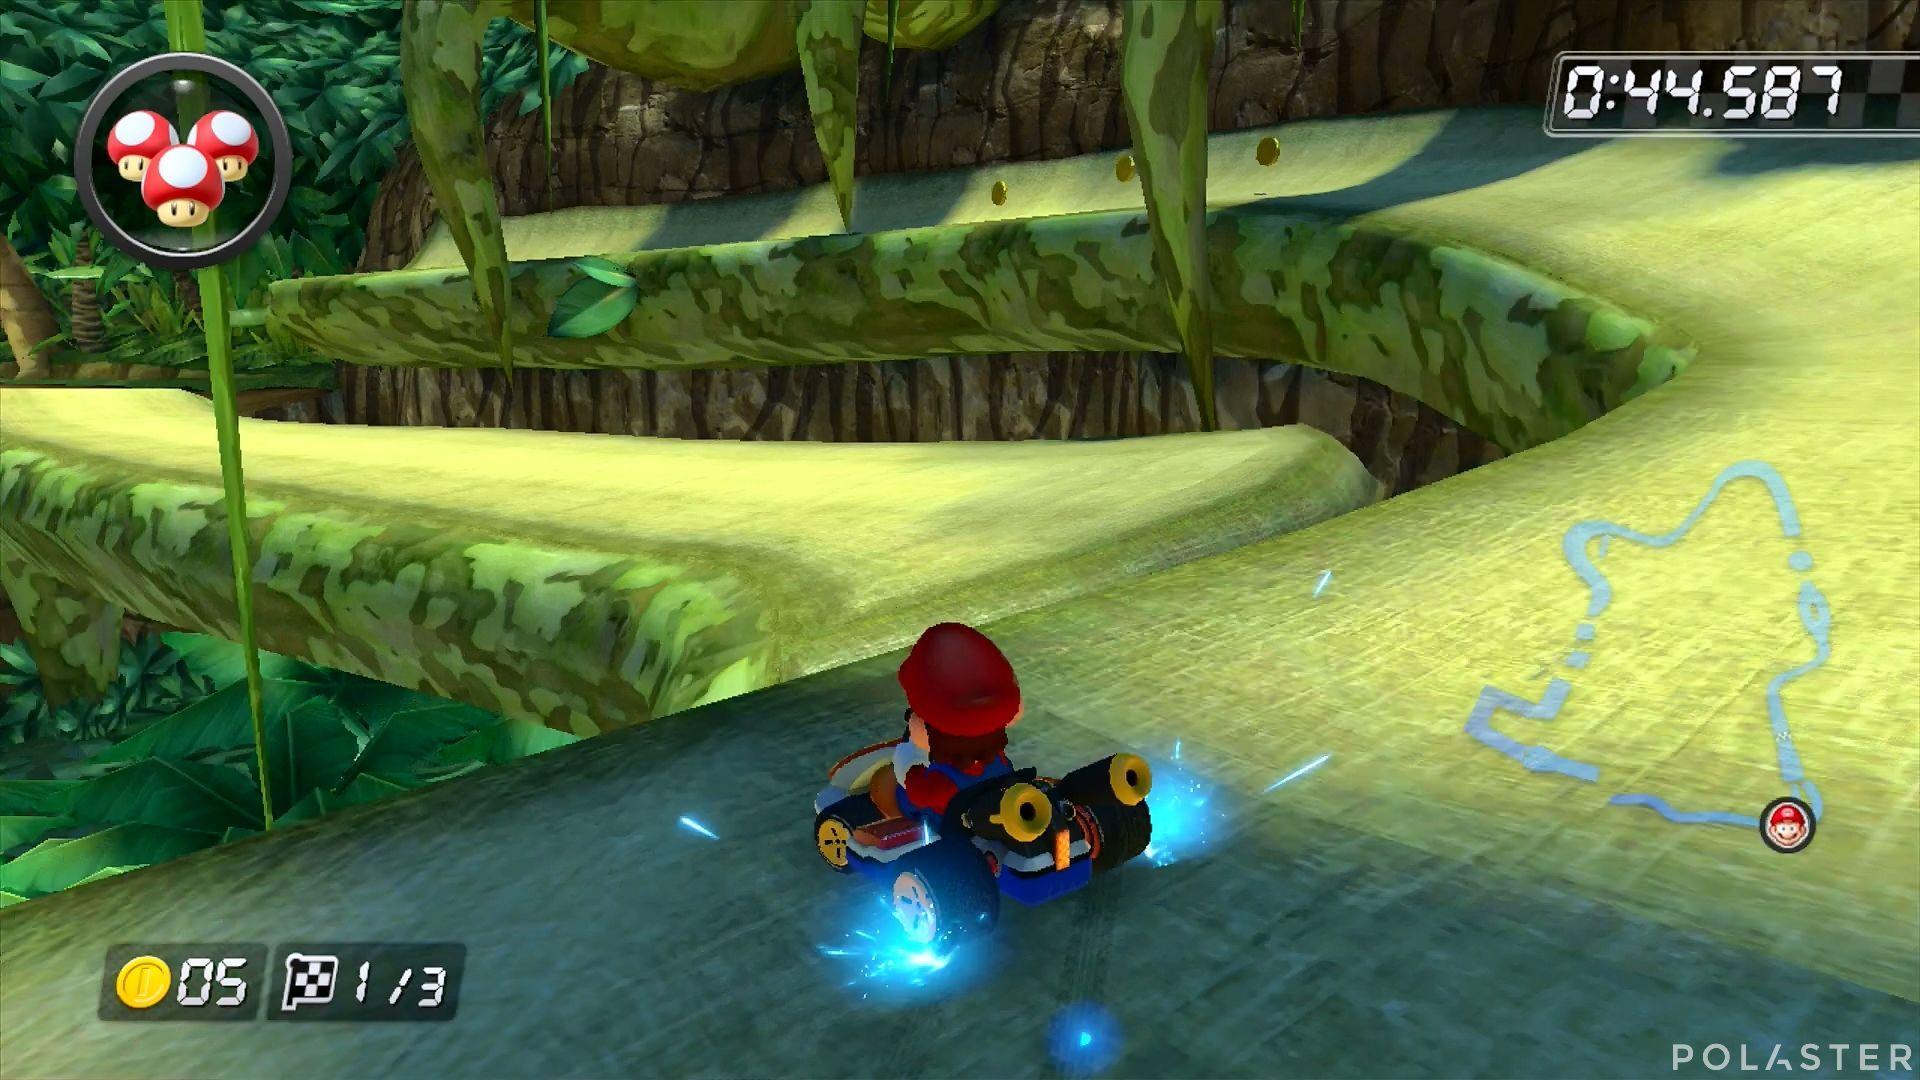 Mario Kart 8 - Jungla DK